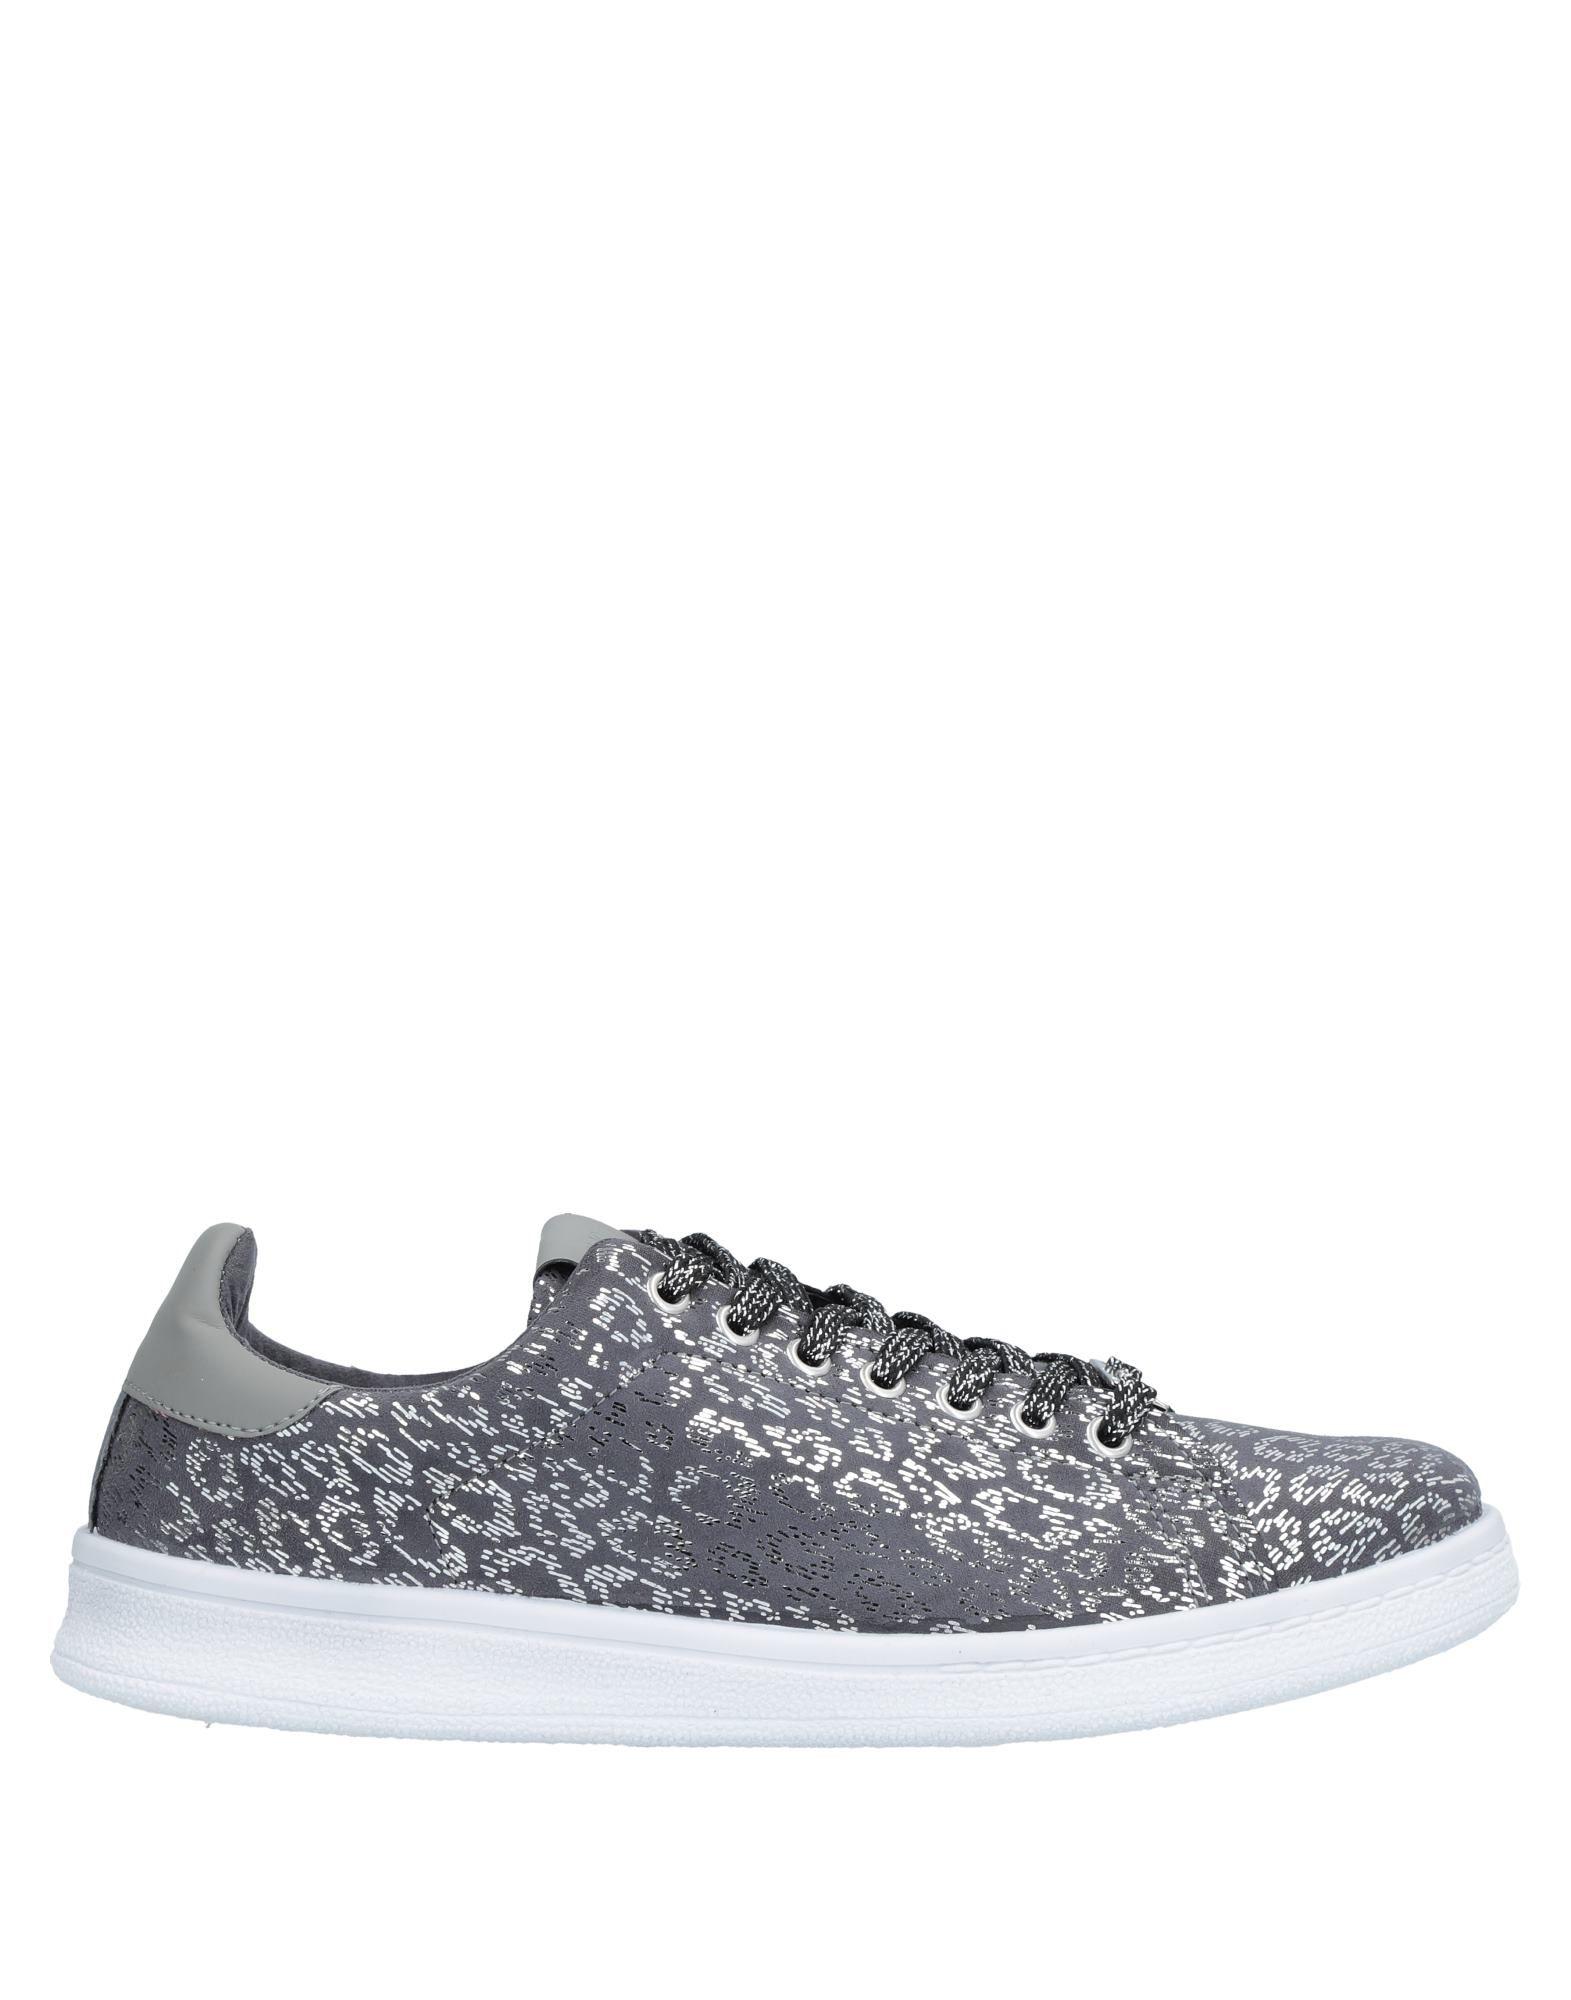 Liu •Jo Schuhes Turnschuhes Damen 11423452CA Gute Qualität beliebte Schuhe